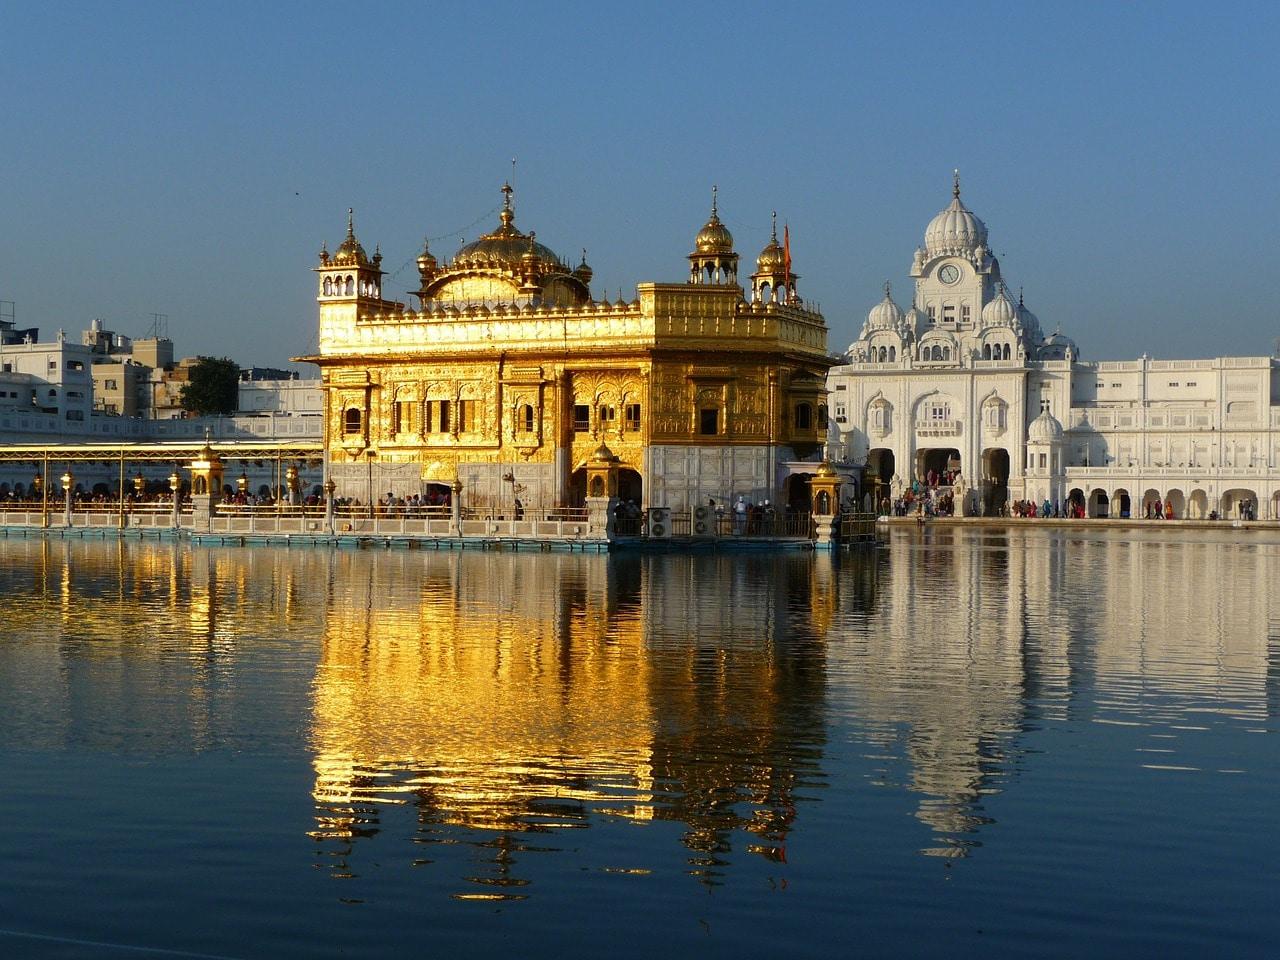 Best 10 Gurudwaras In India 2020-Description, Guide & Advisory 1